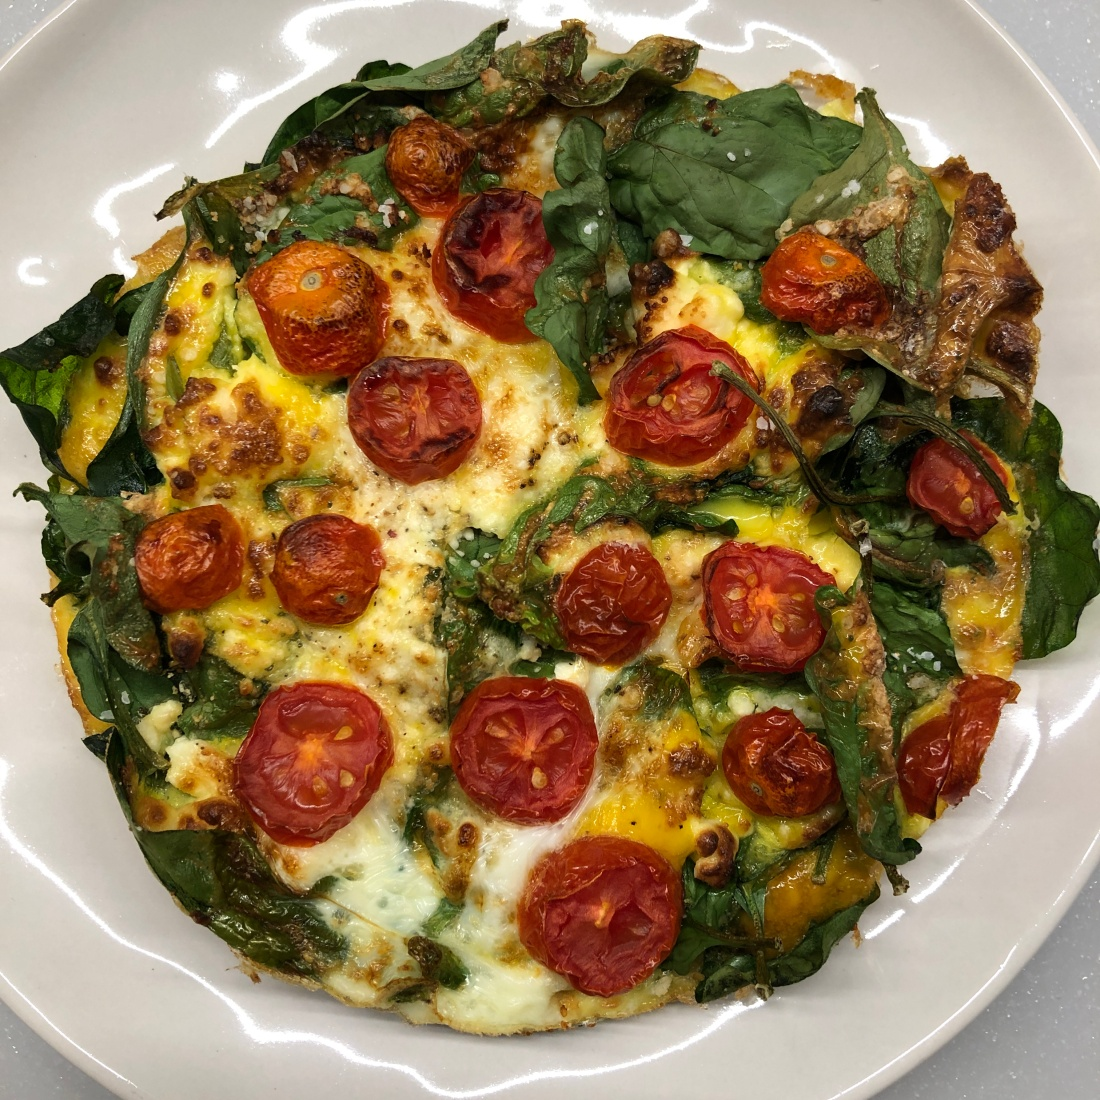 photo of a spinach, tomato, and feta frittata